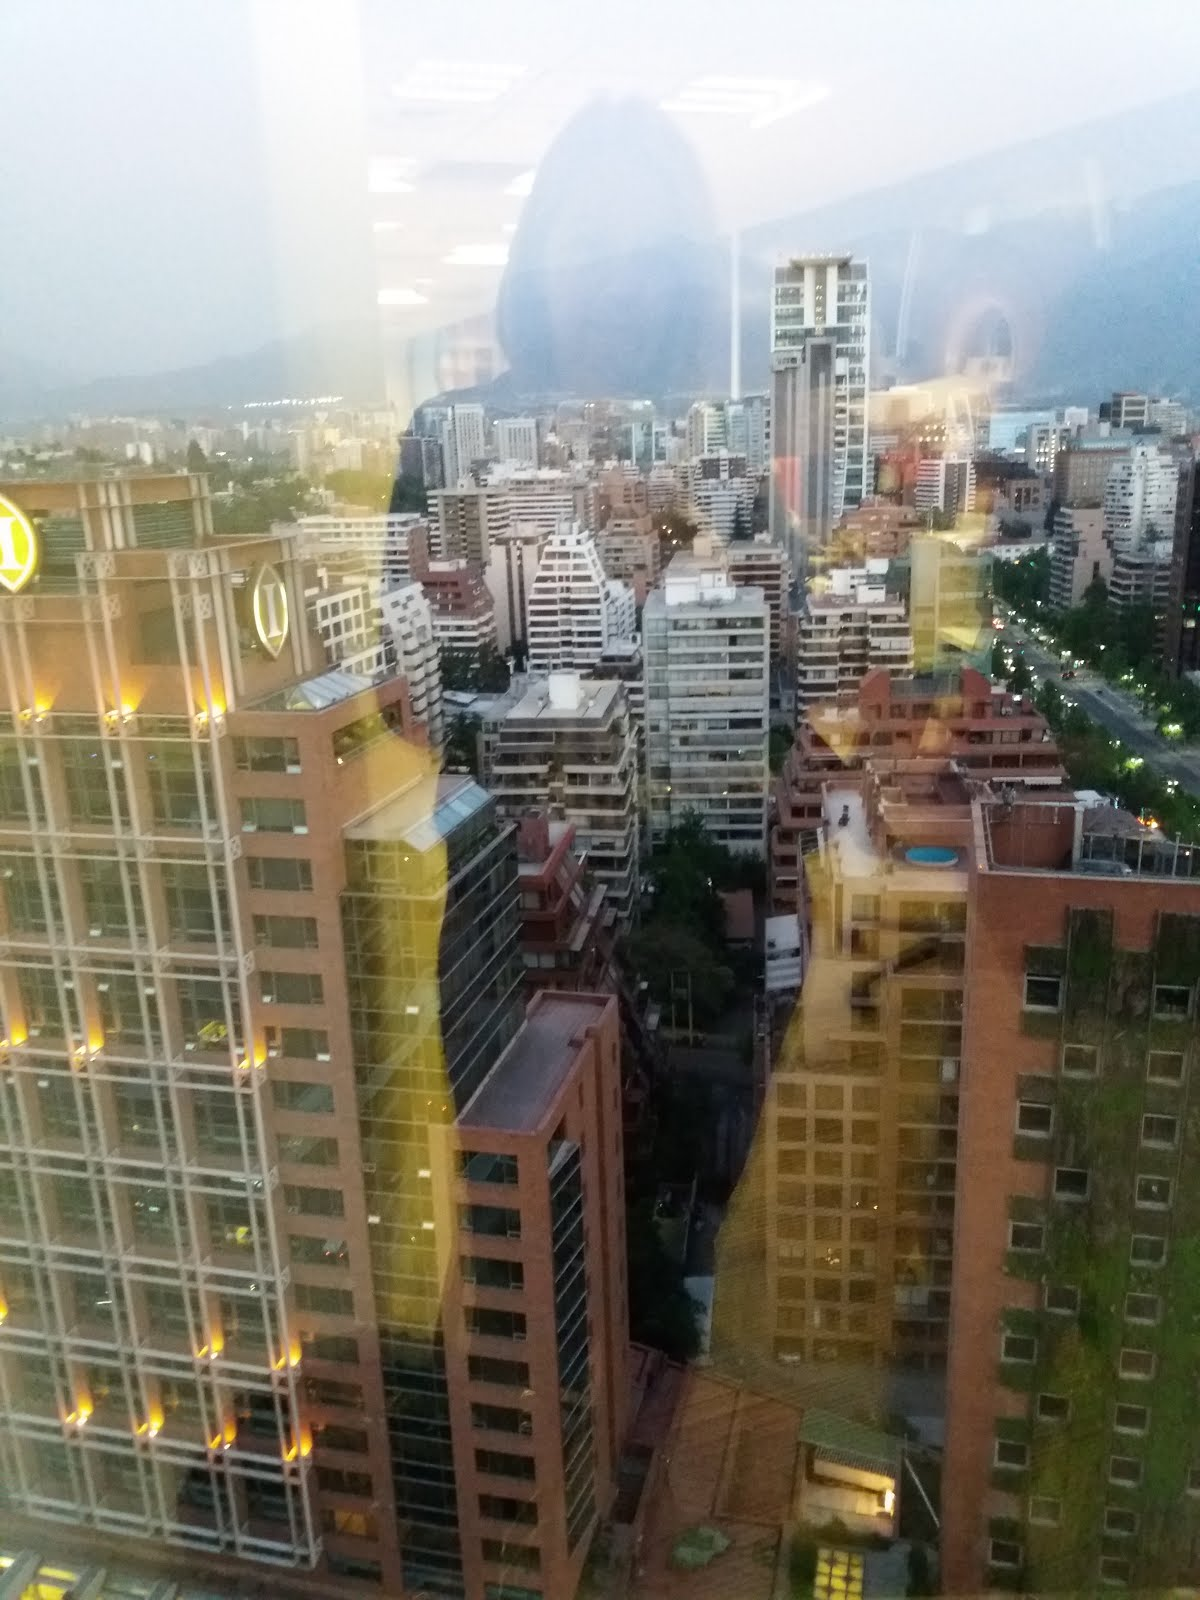 Autorretrato pixelado a 21 pisos de altura